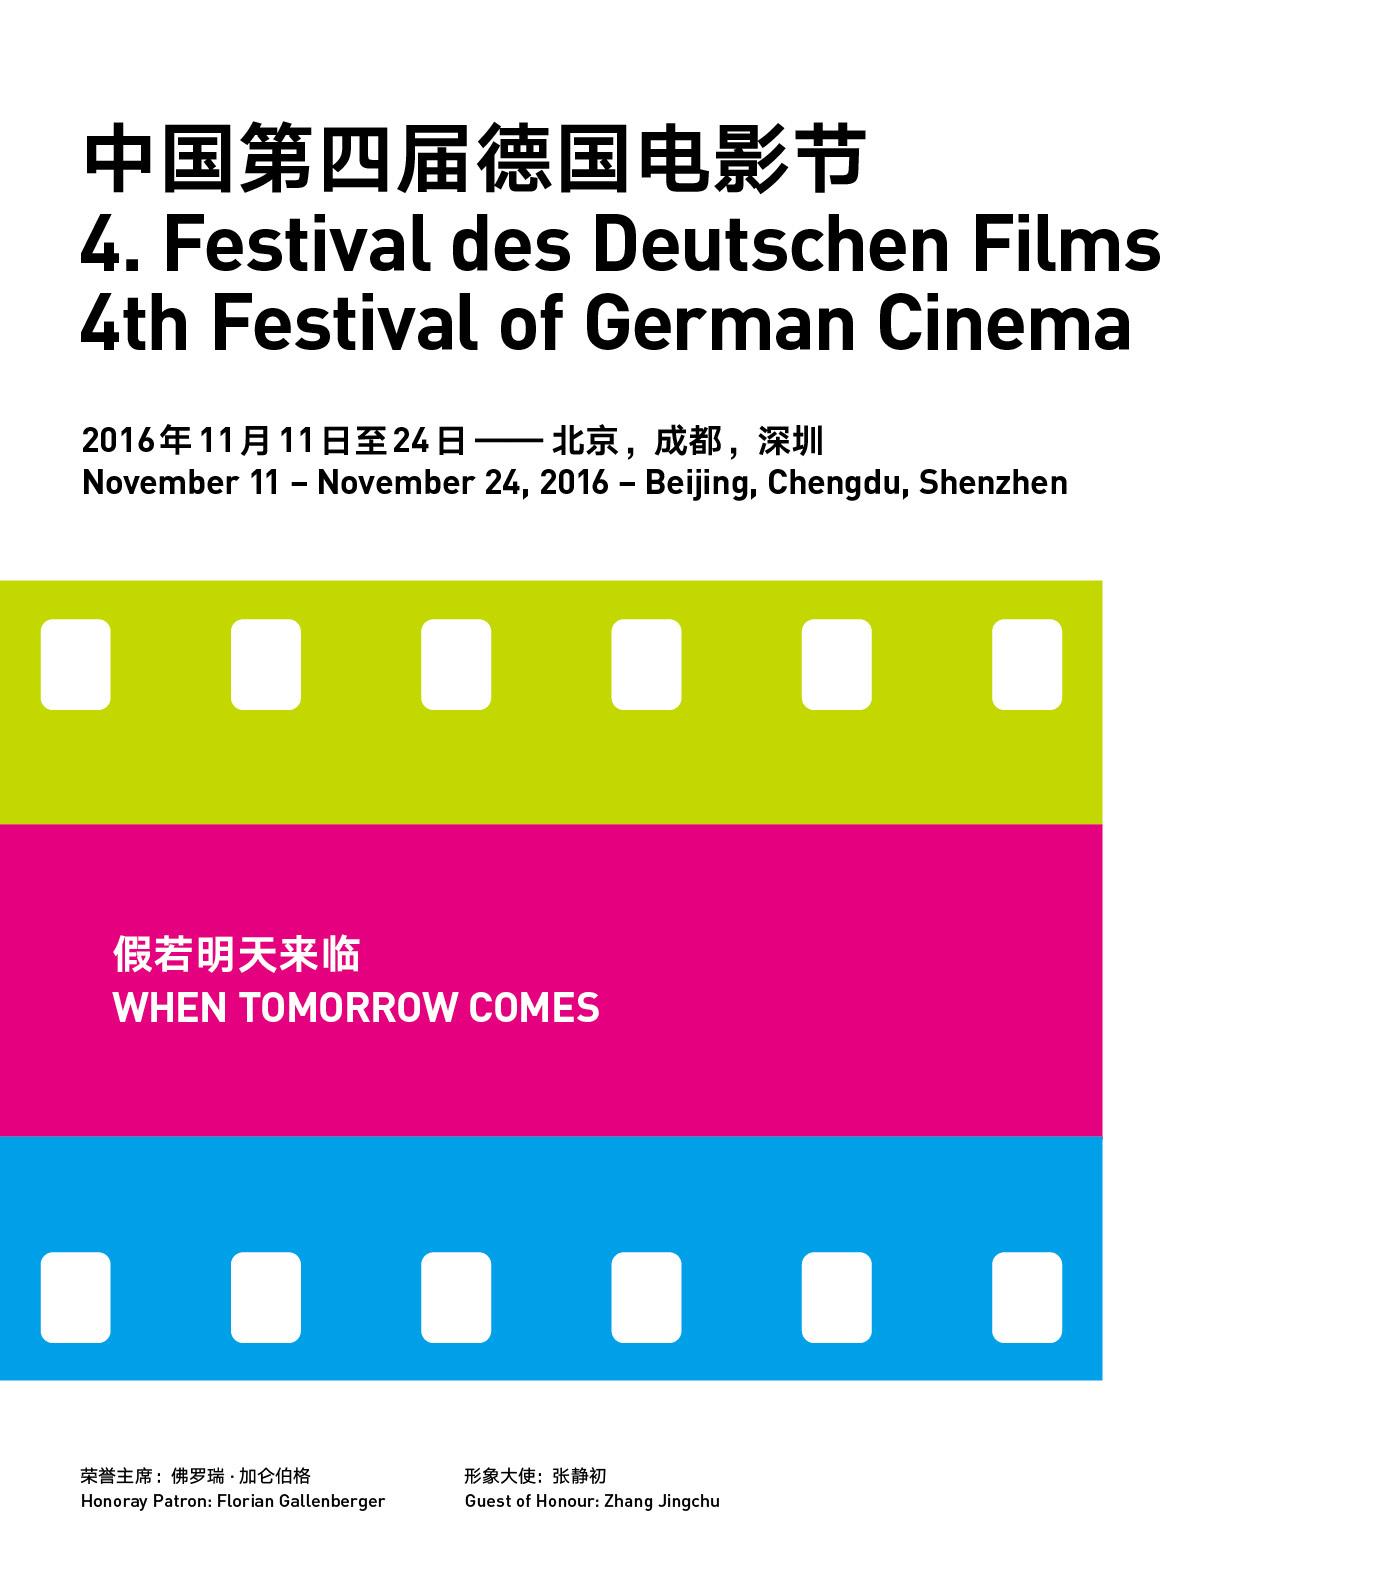 4th-Festival-of-German-Cinema.jpg#asset: